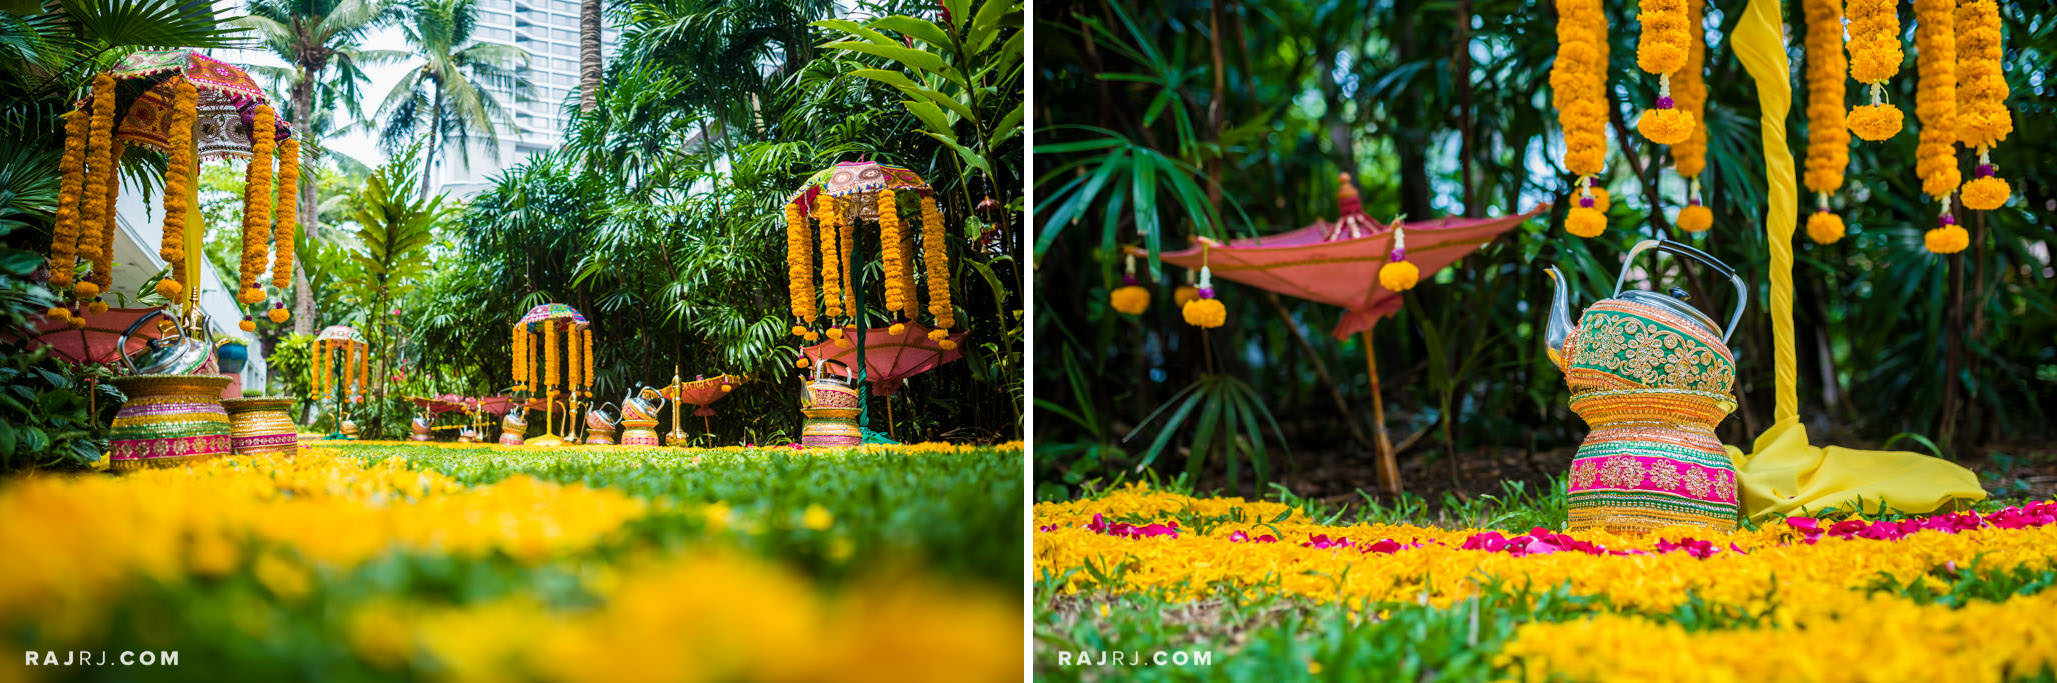 RAJ_THAILAND_WEDDING_PHOTOGRAPHY-2_2.jpg